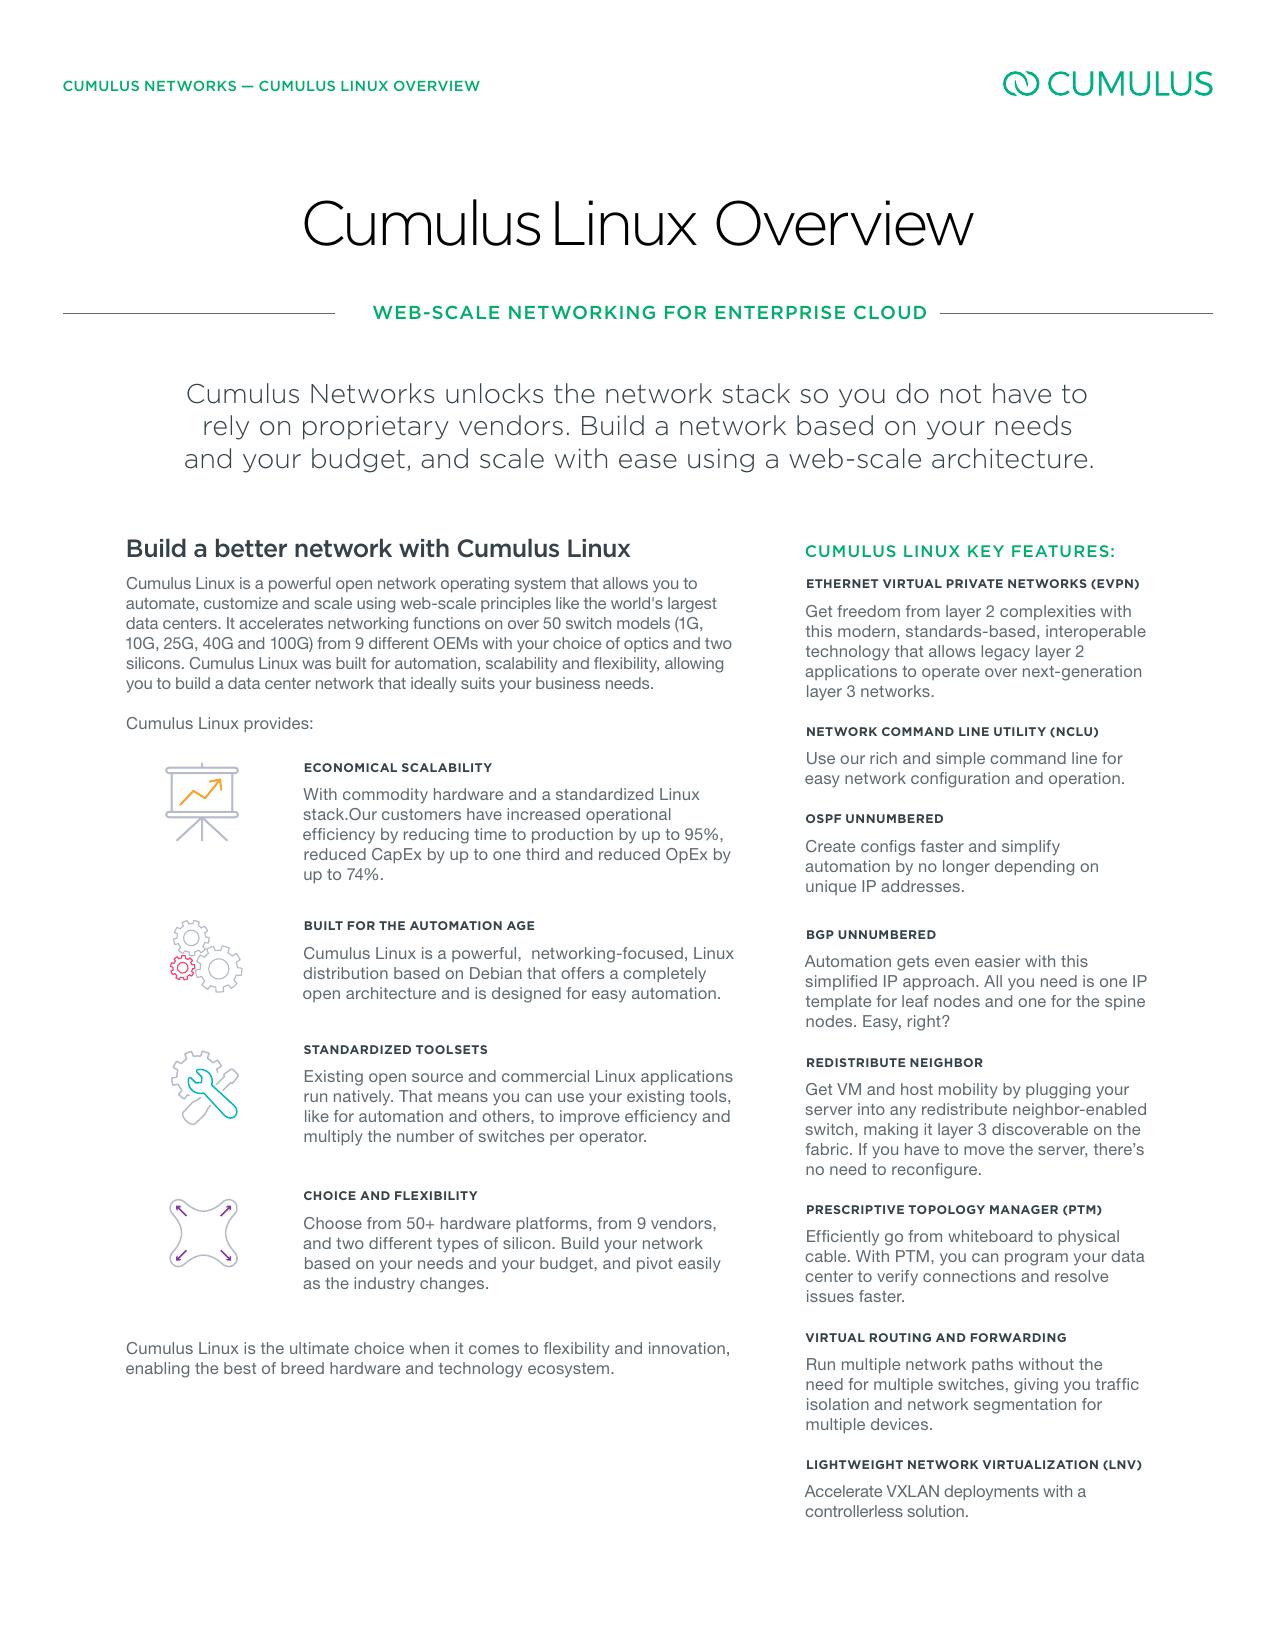 CumulusLinux Overview   manualzz com